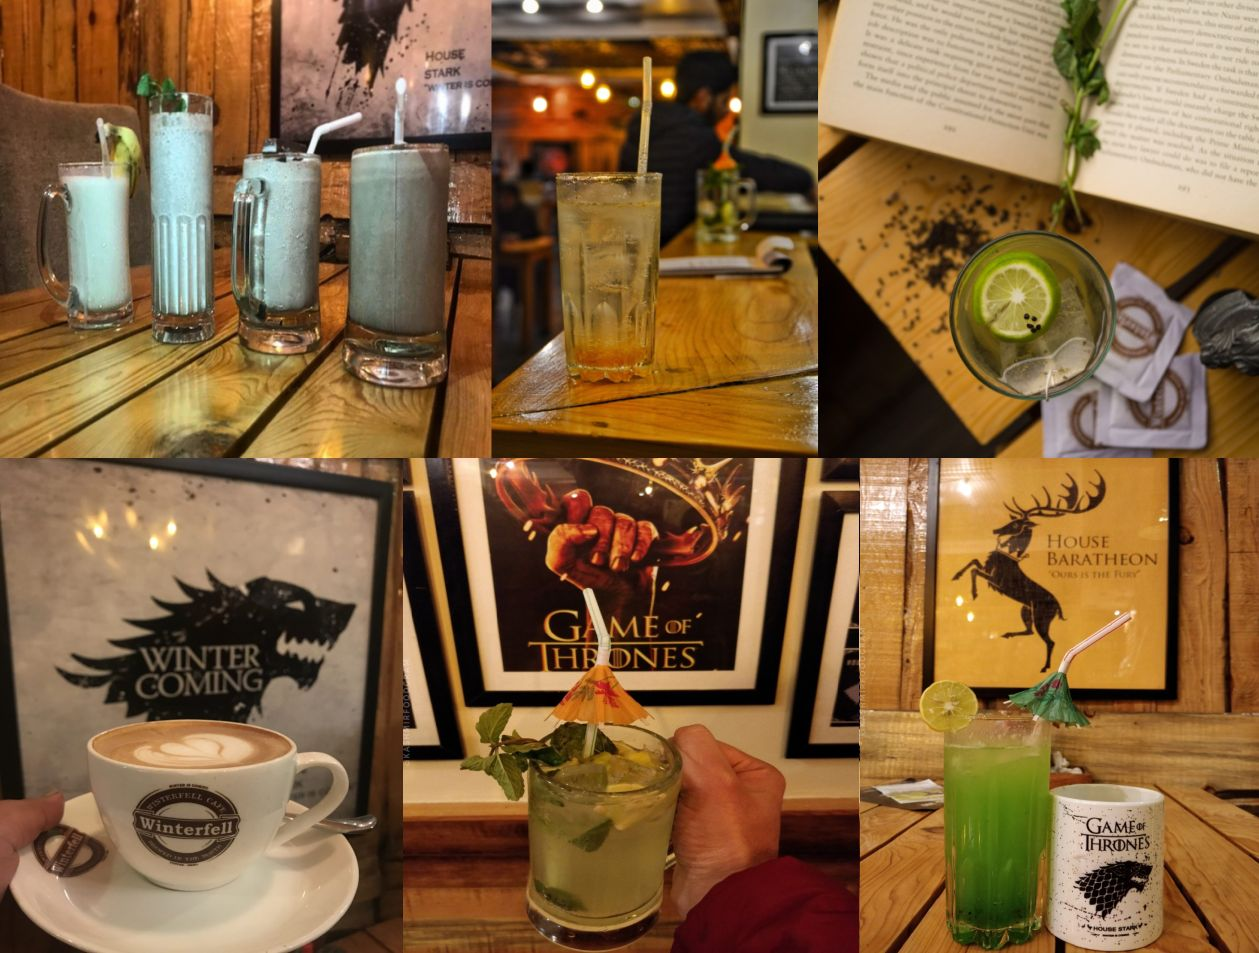 Source: https://khyenchyen.net/2018/11/23/winterfell-cafe-hosts-top-food-bloggers-meet-beverage-tasting-event/